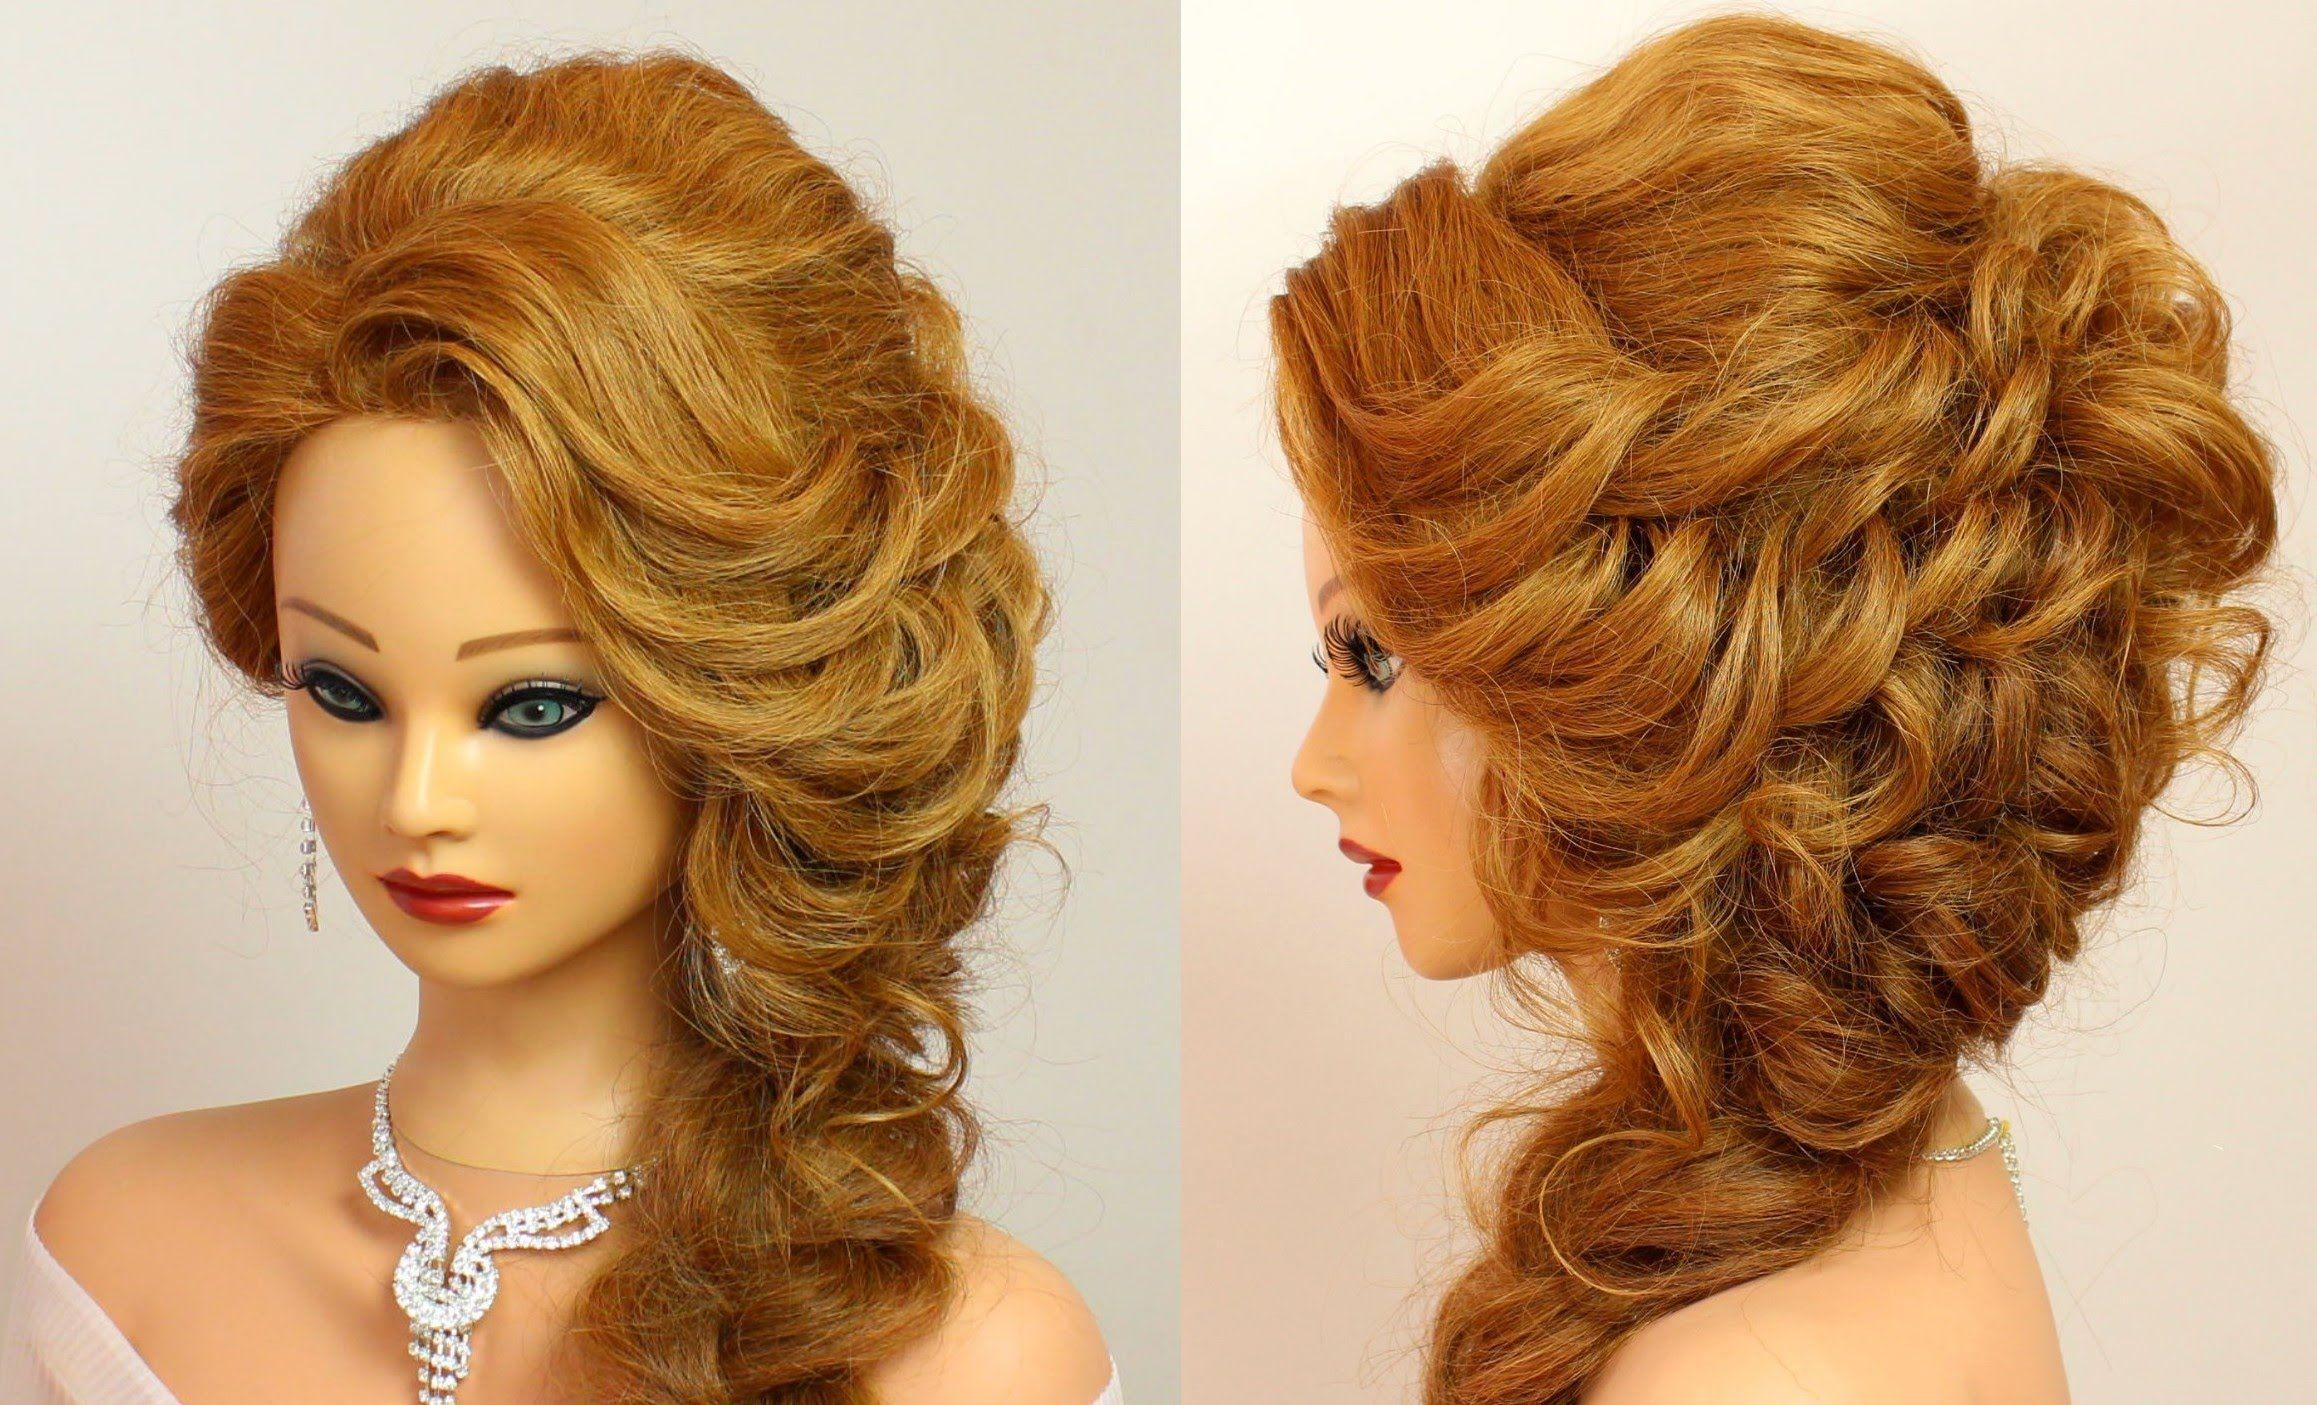 Prom Hairstyle For Medium Long Hair Tutorial Long Hair Tutorial Hair Tutorial Party Hairstyles For Long Hair